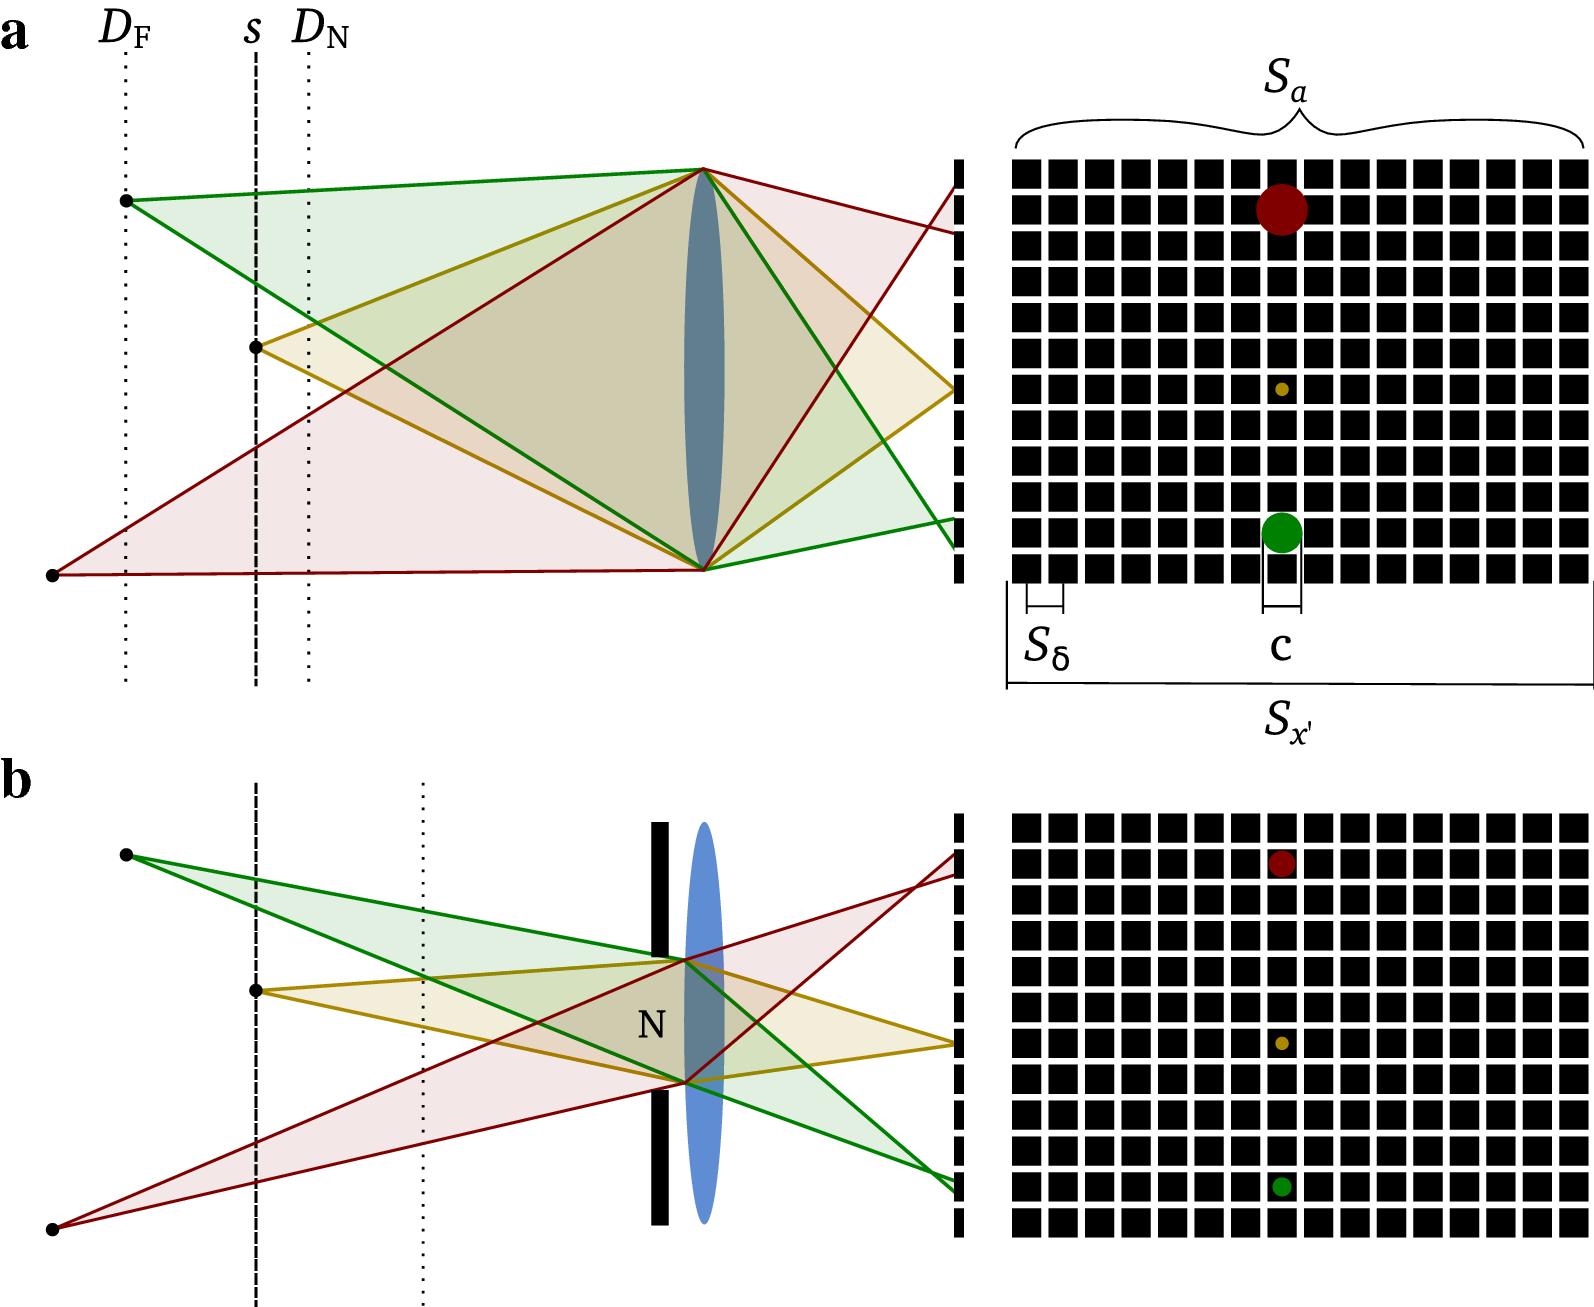 PhenoFly Planning Tool: flight planning for high-resolution